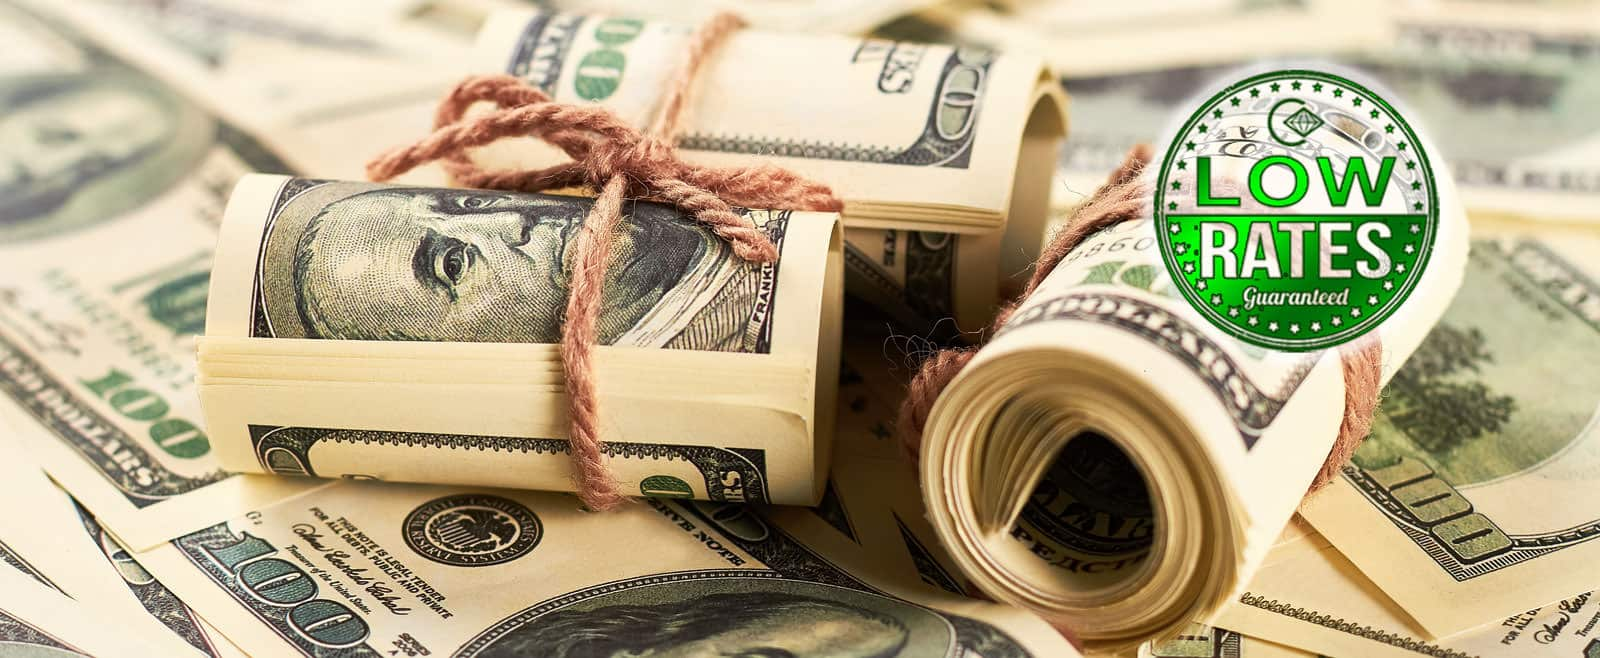 cash bundled for a pawn shop loan